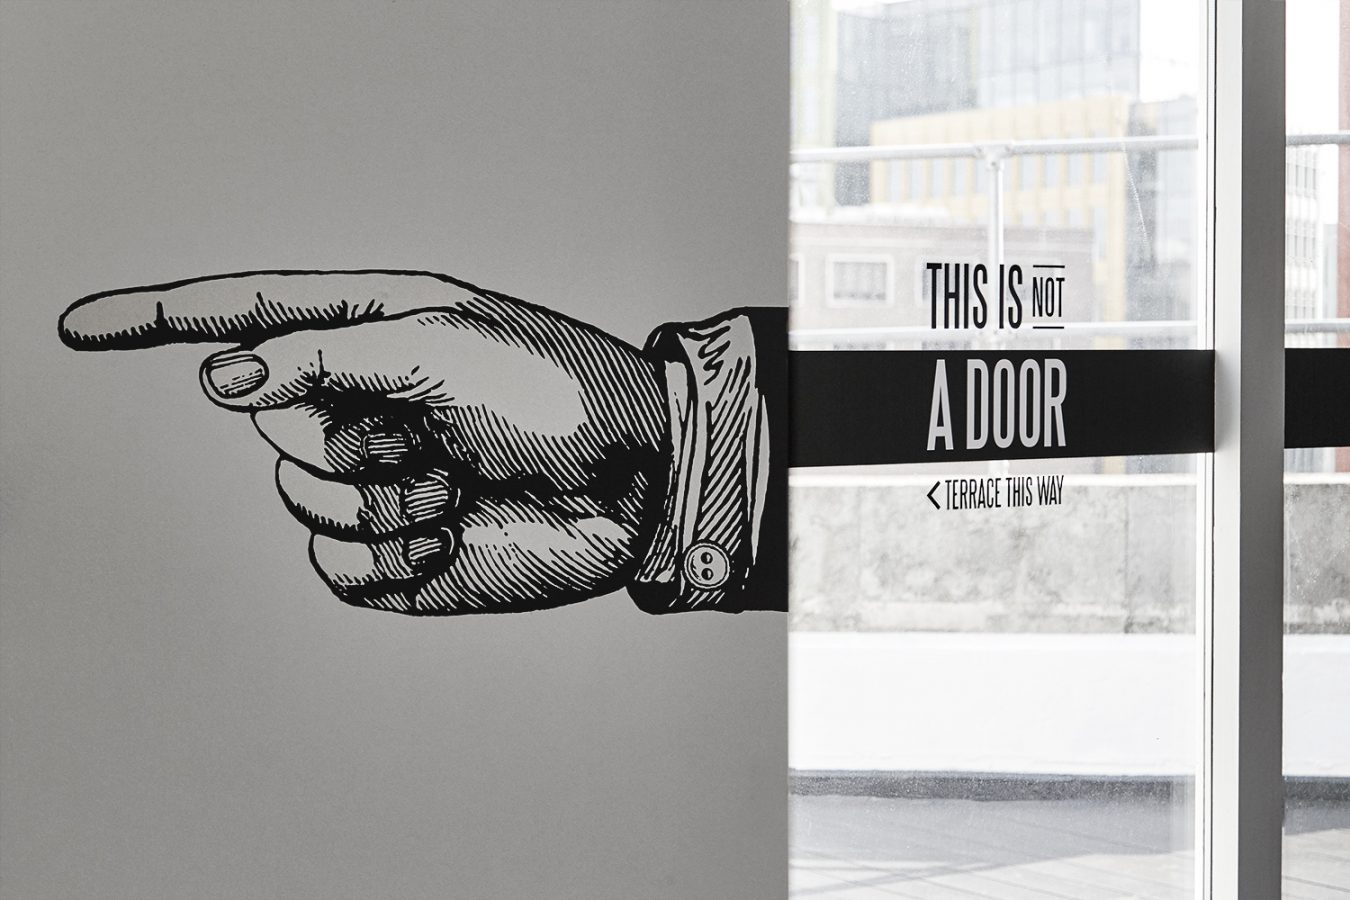 Good_Stuff_389 window arm_cool_workspace_office_design_interiors_graphic_london_decal_terrace_door